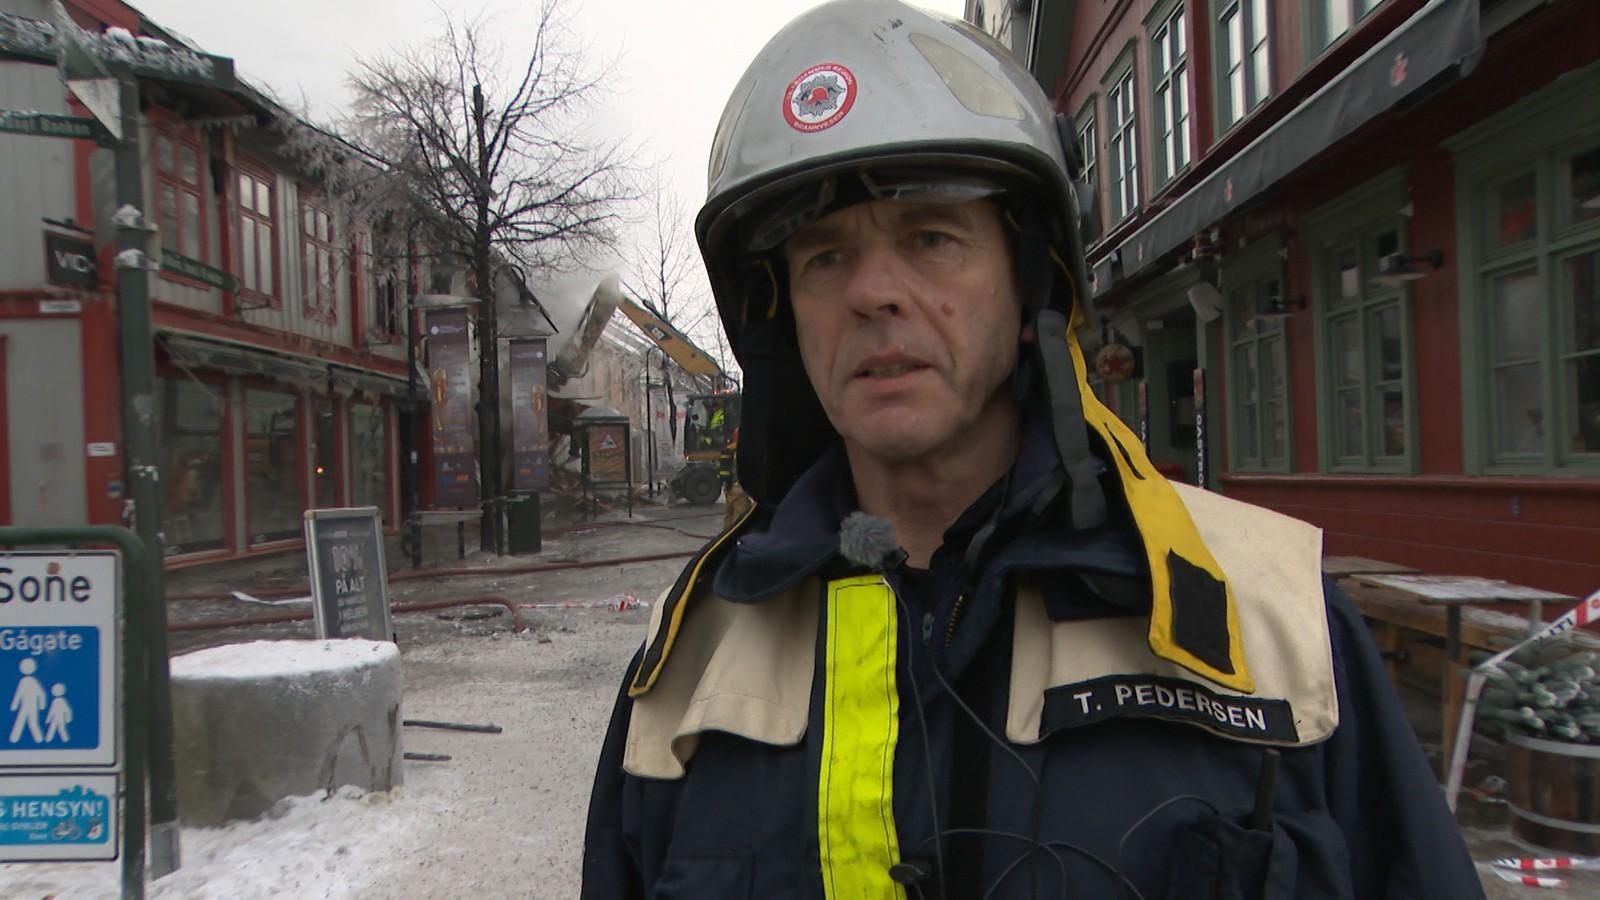 JOBBET I NATT: Trond Pedersen i Lillehammer brannvesen.